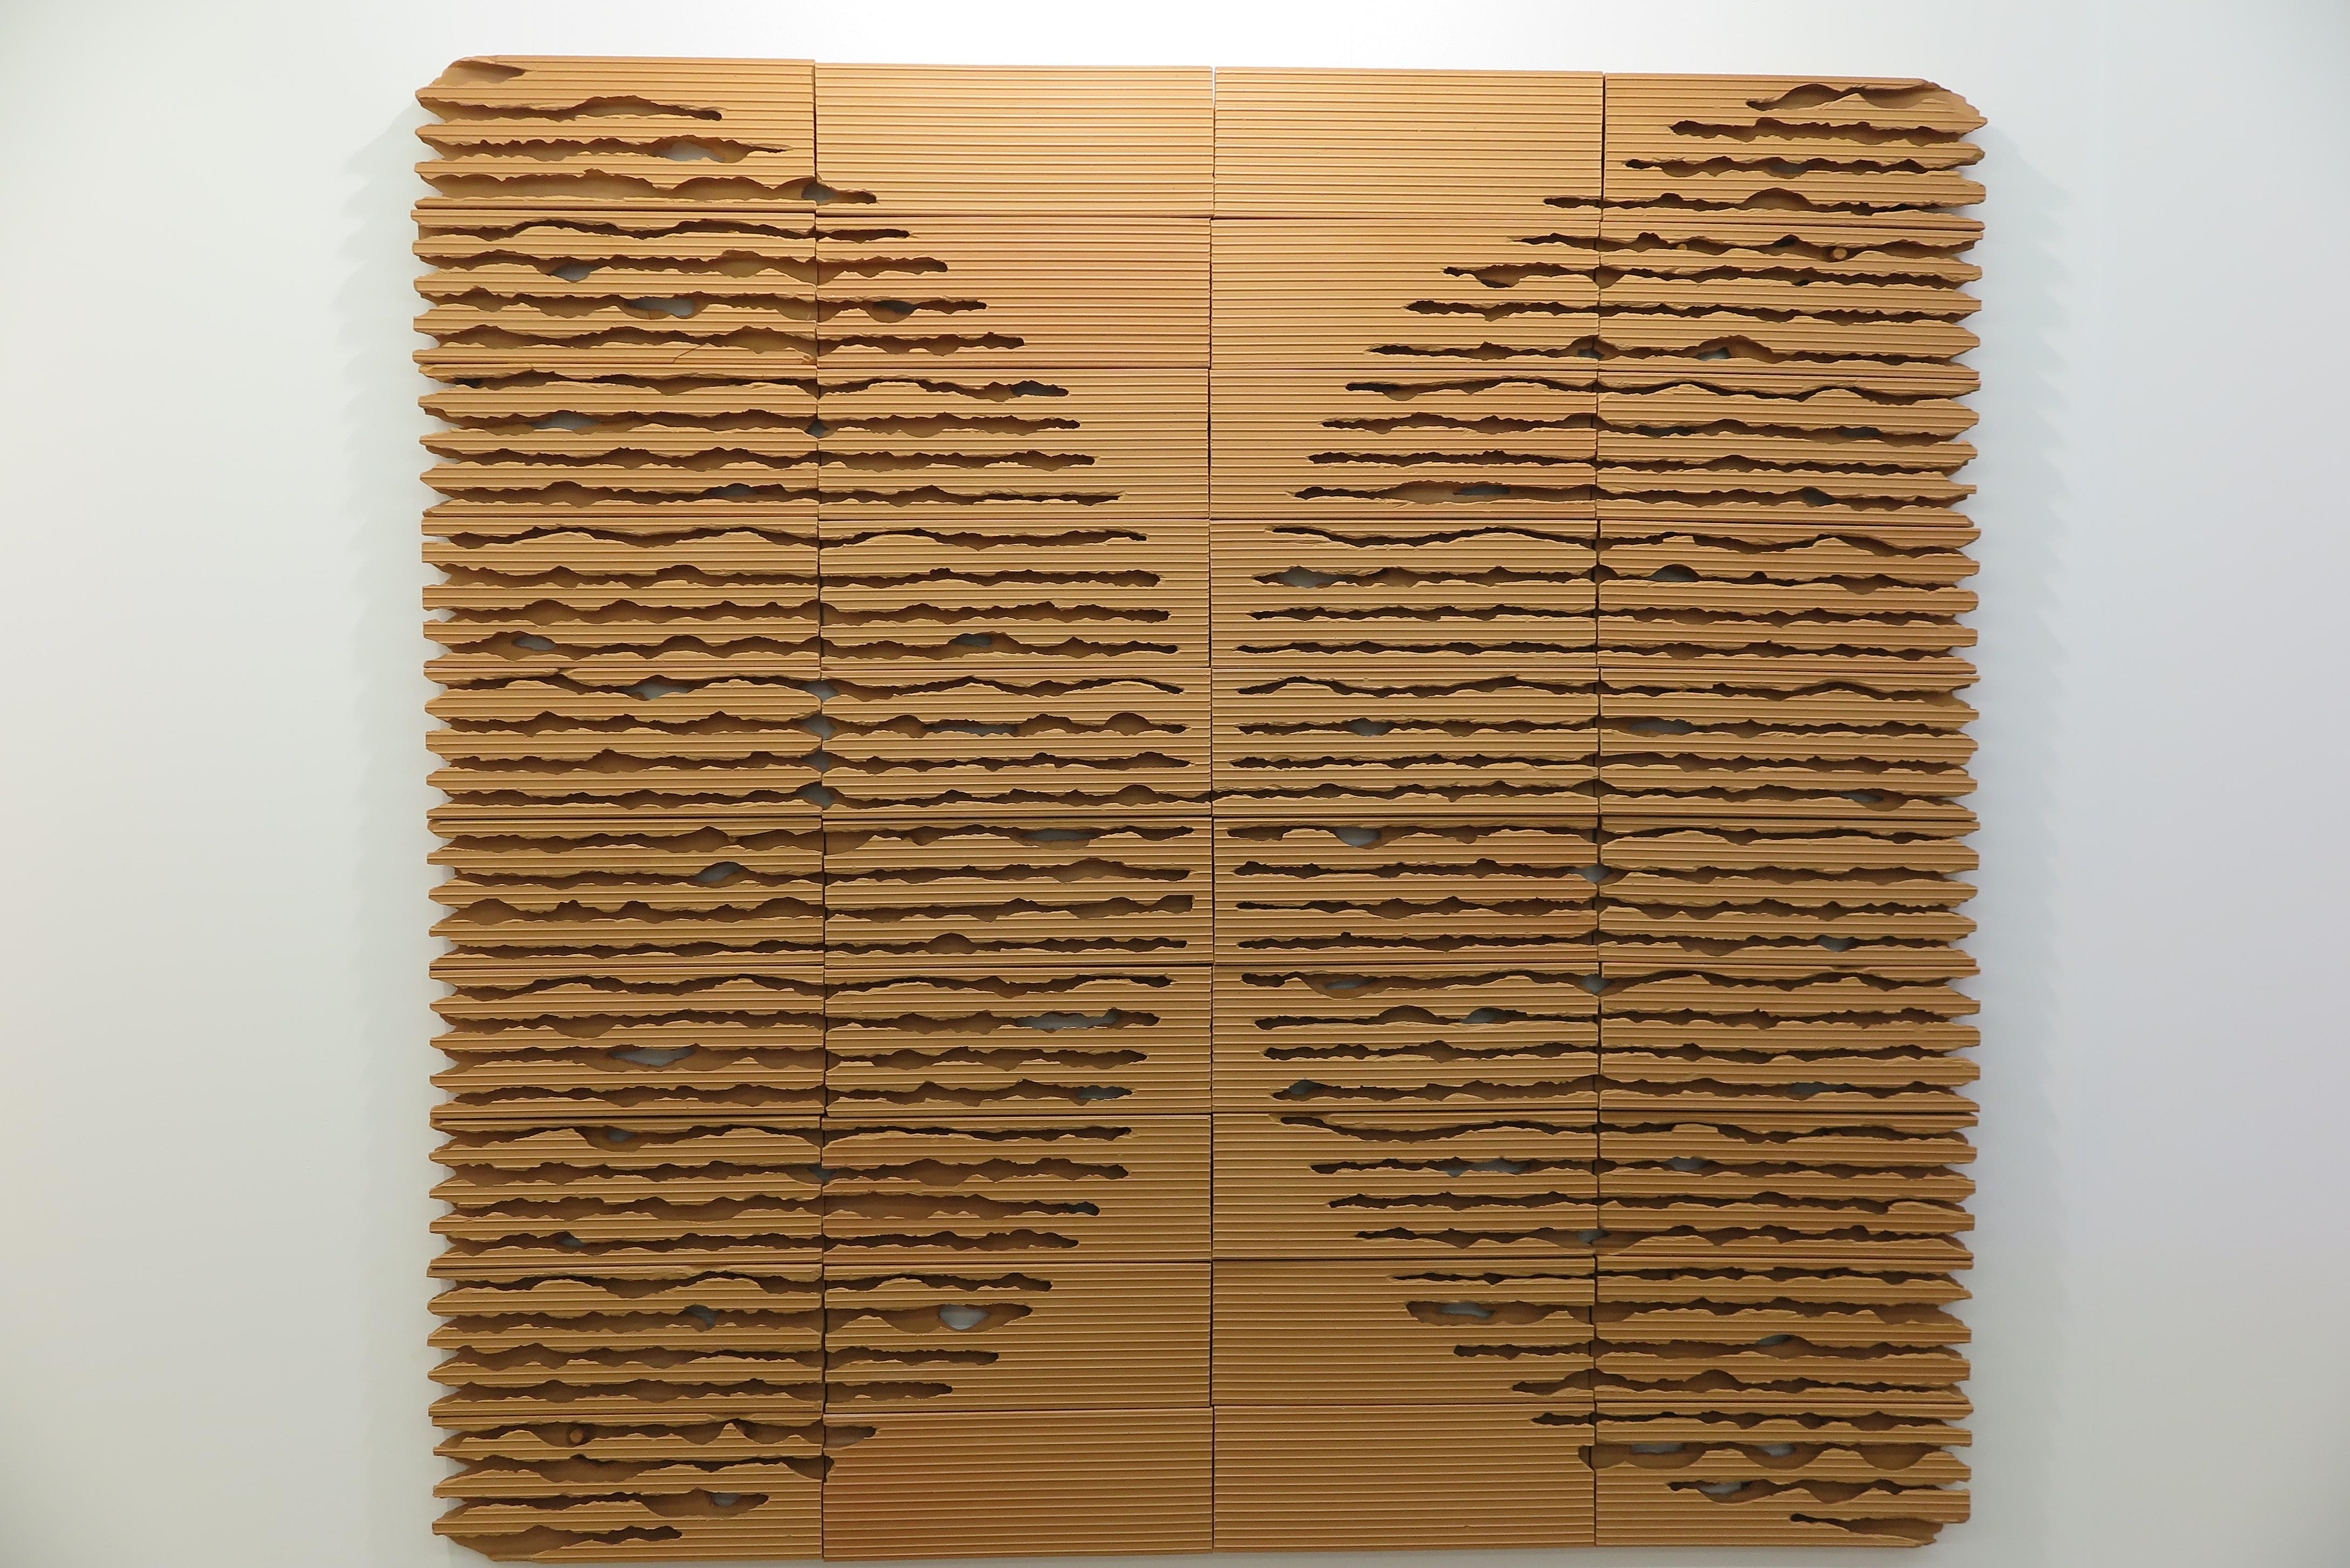 Galerie Martin van Zomeren. Kunstenaar:Oscar Abraham Pabon (Main)